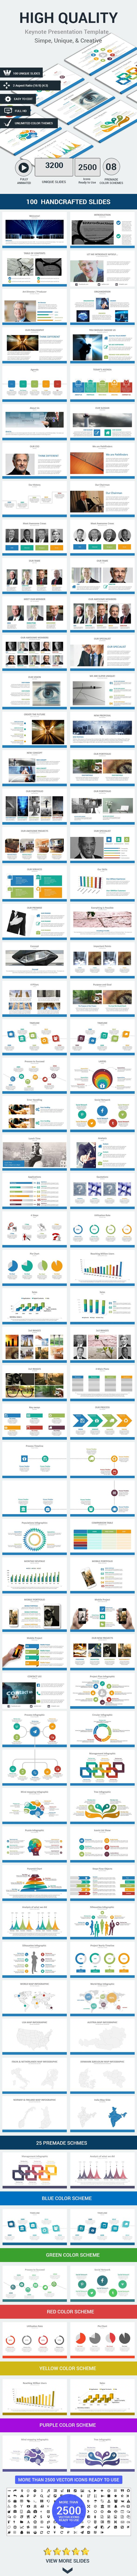 High quality Keynote Presentation Template - Keynote Templates Presentation Templates